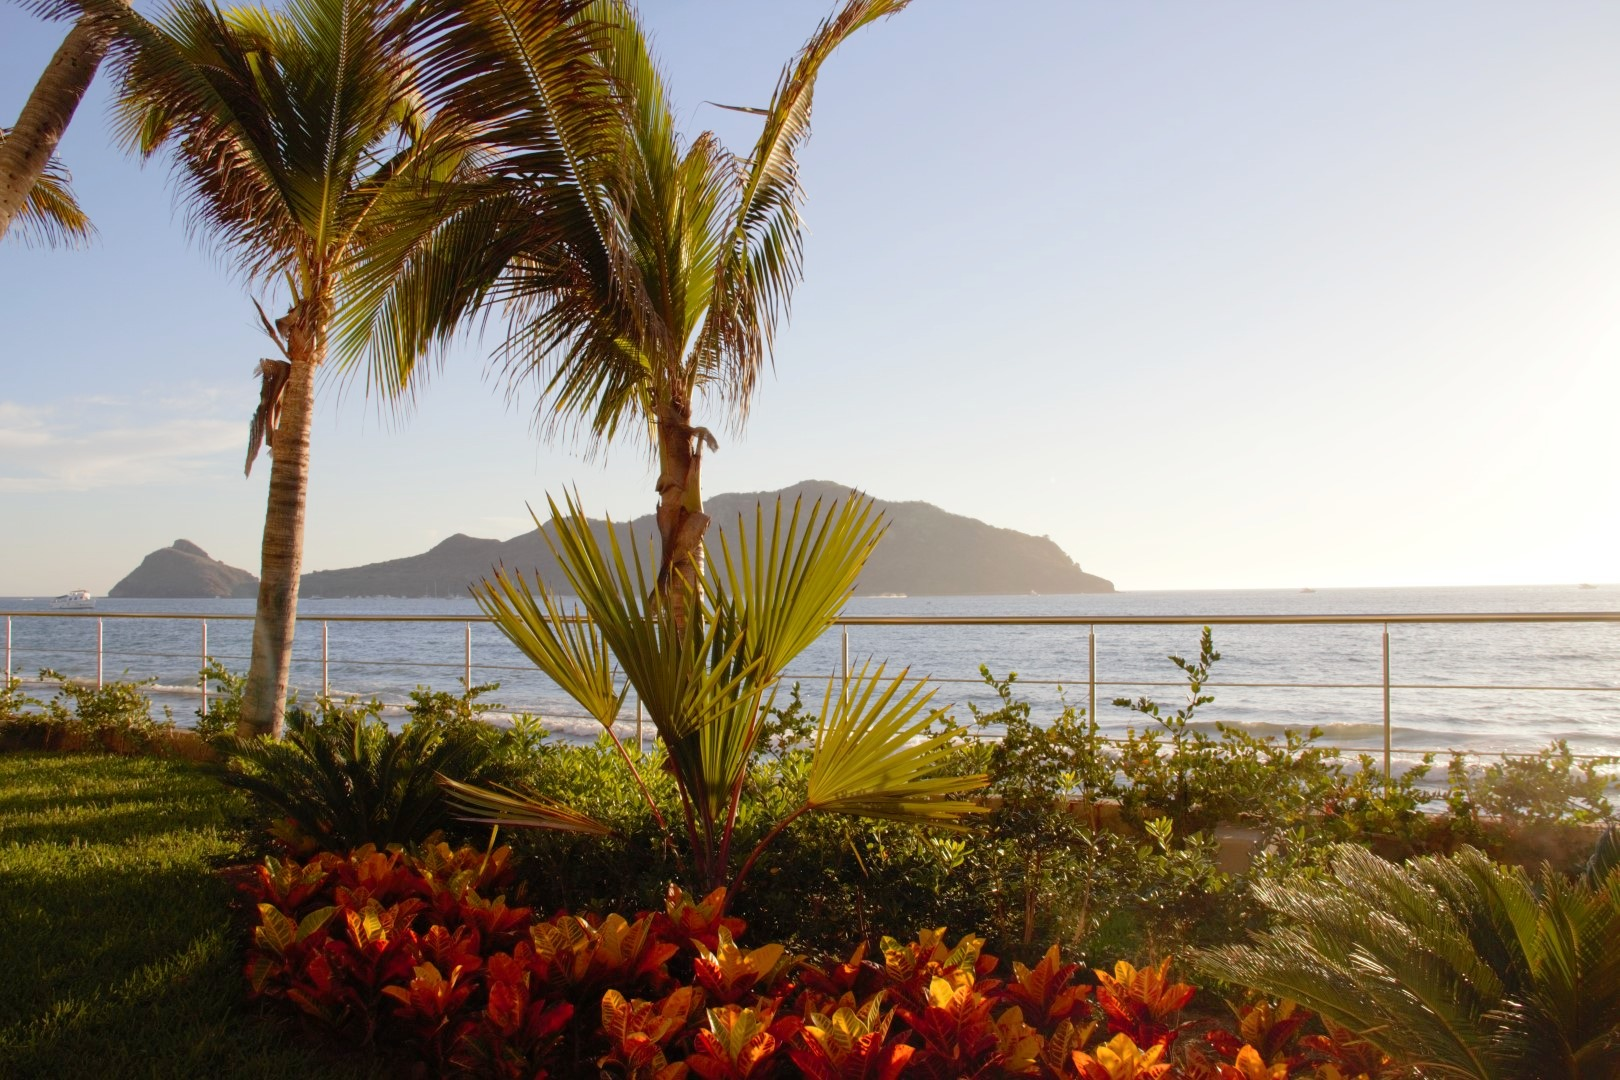 Island views.